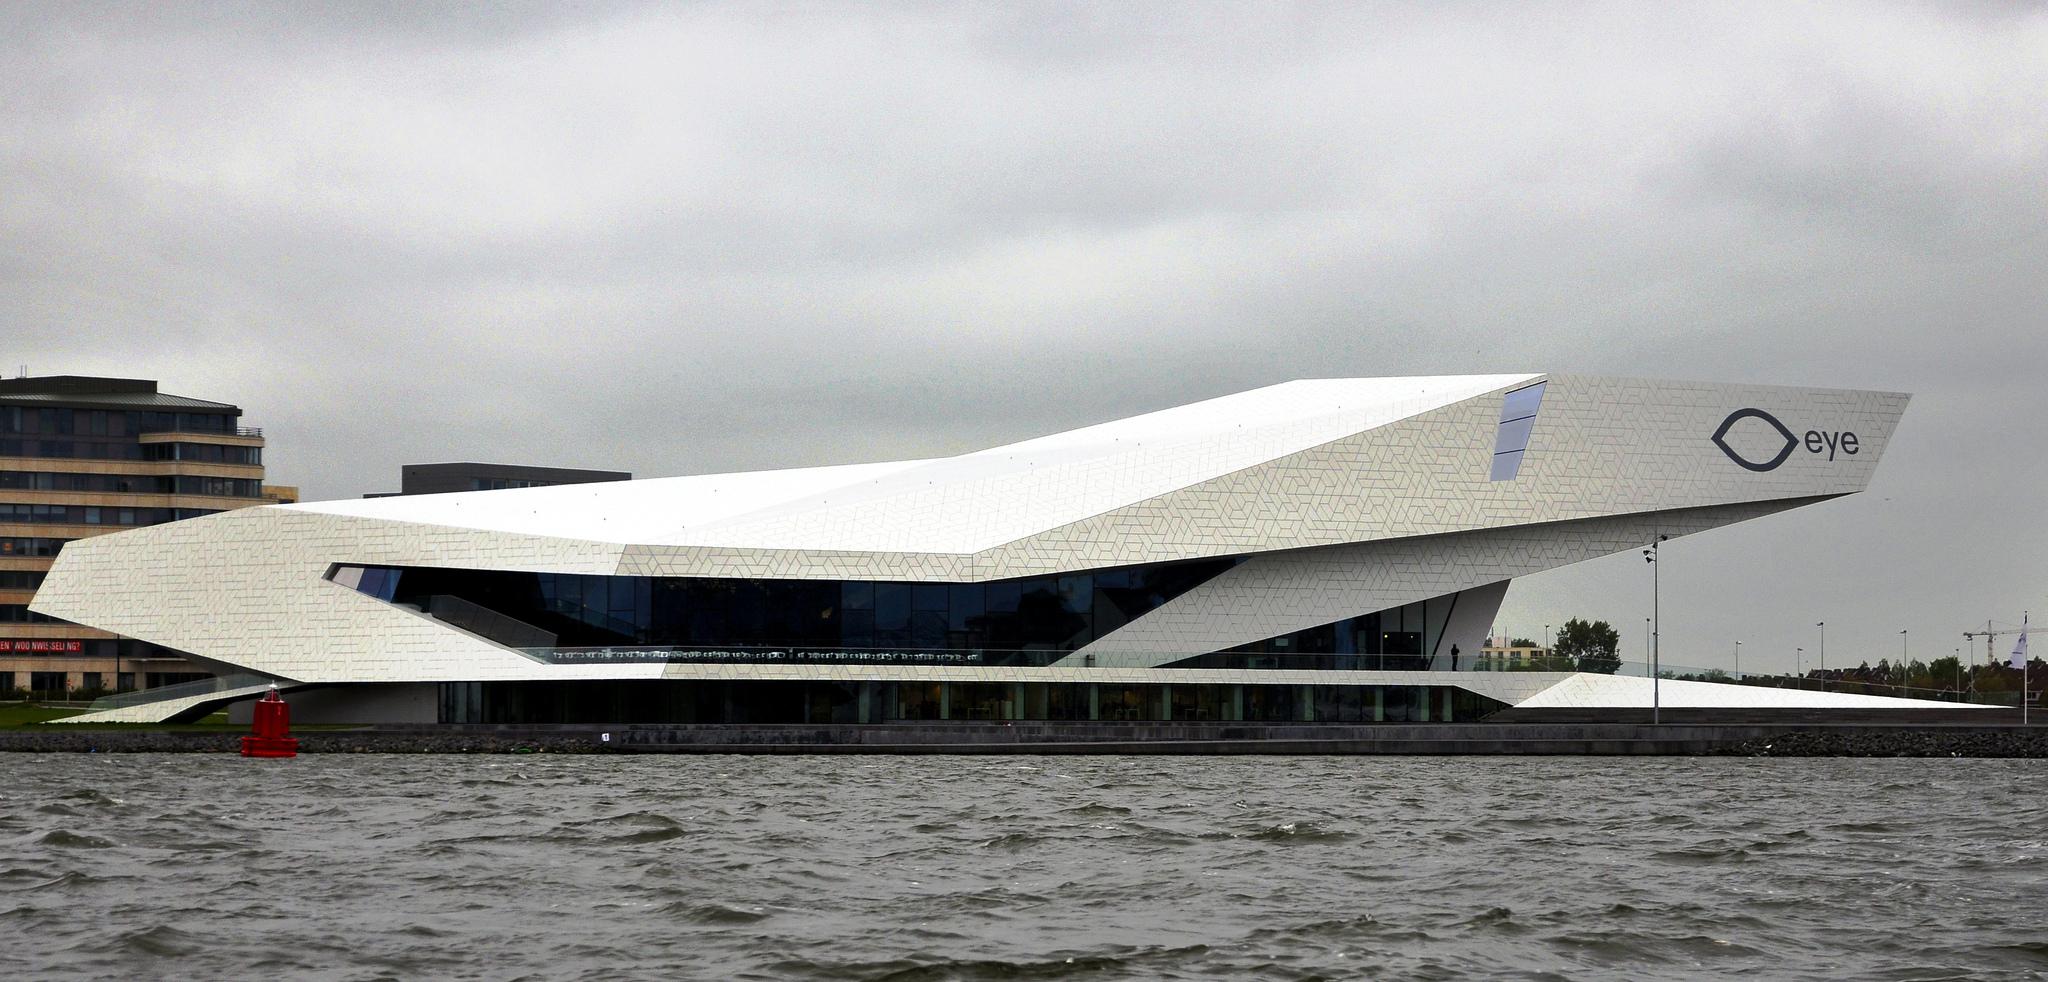 8 Unique And Unusual Restaurants To Visit In Amsterdam